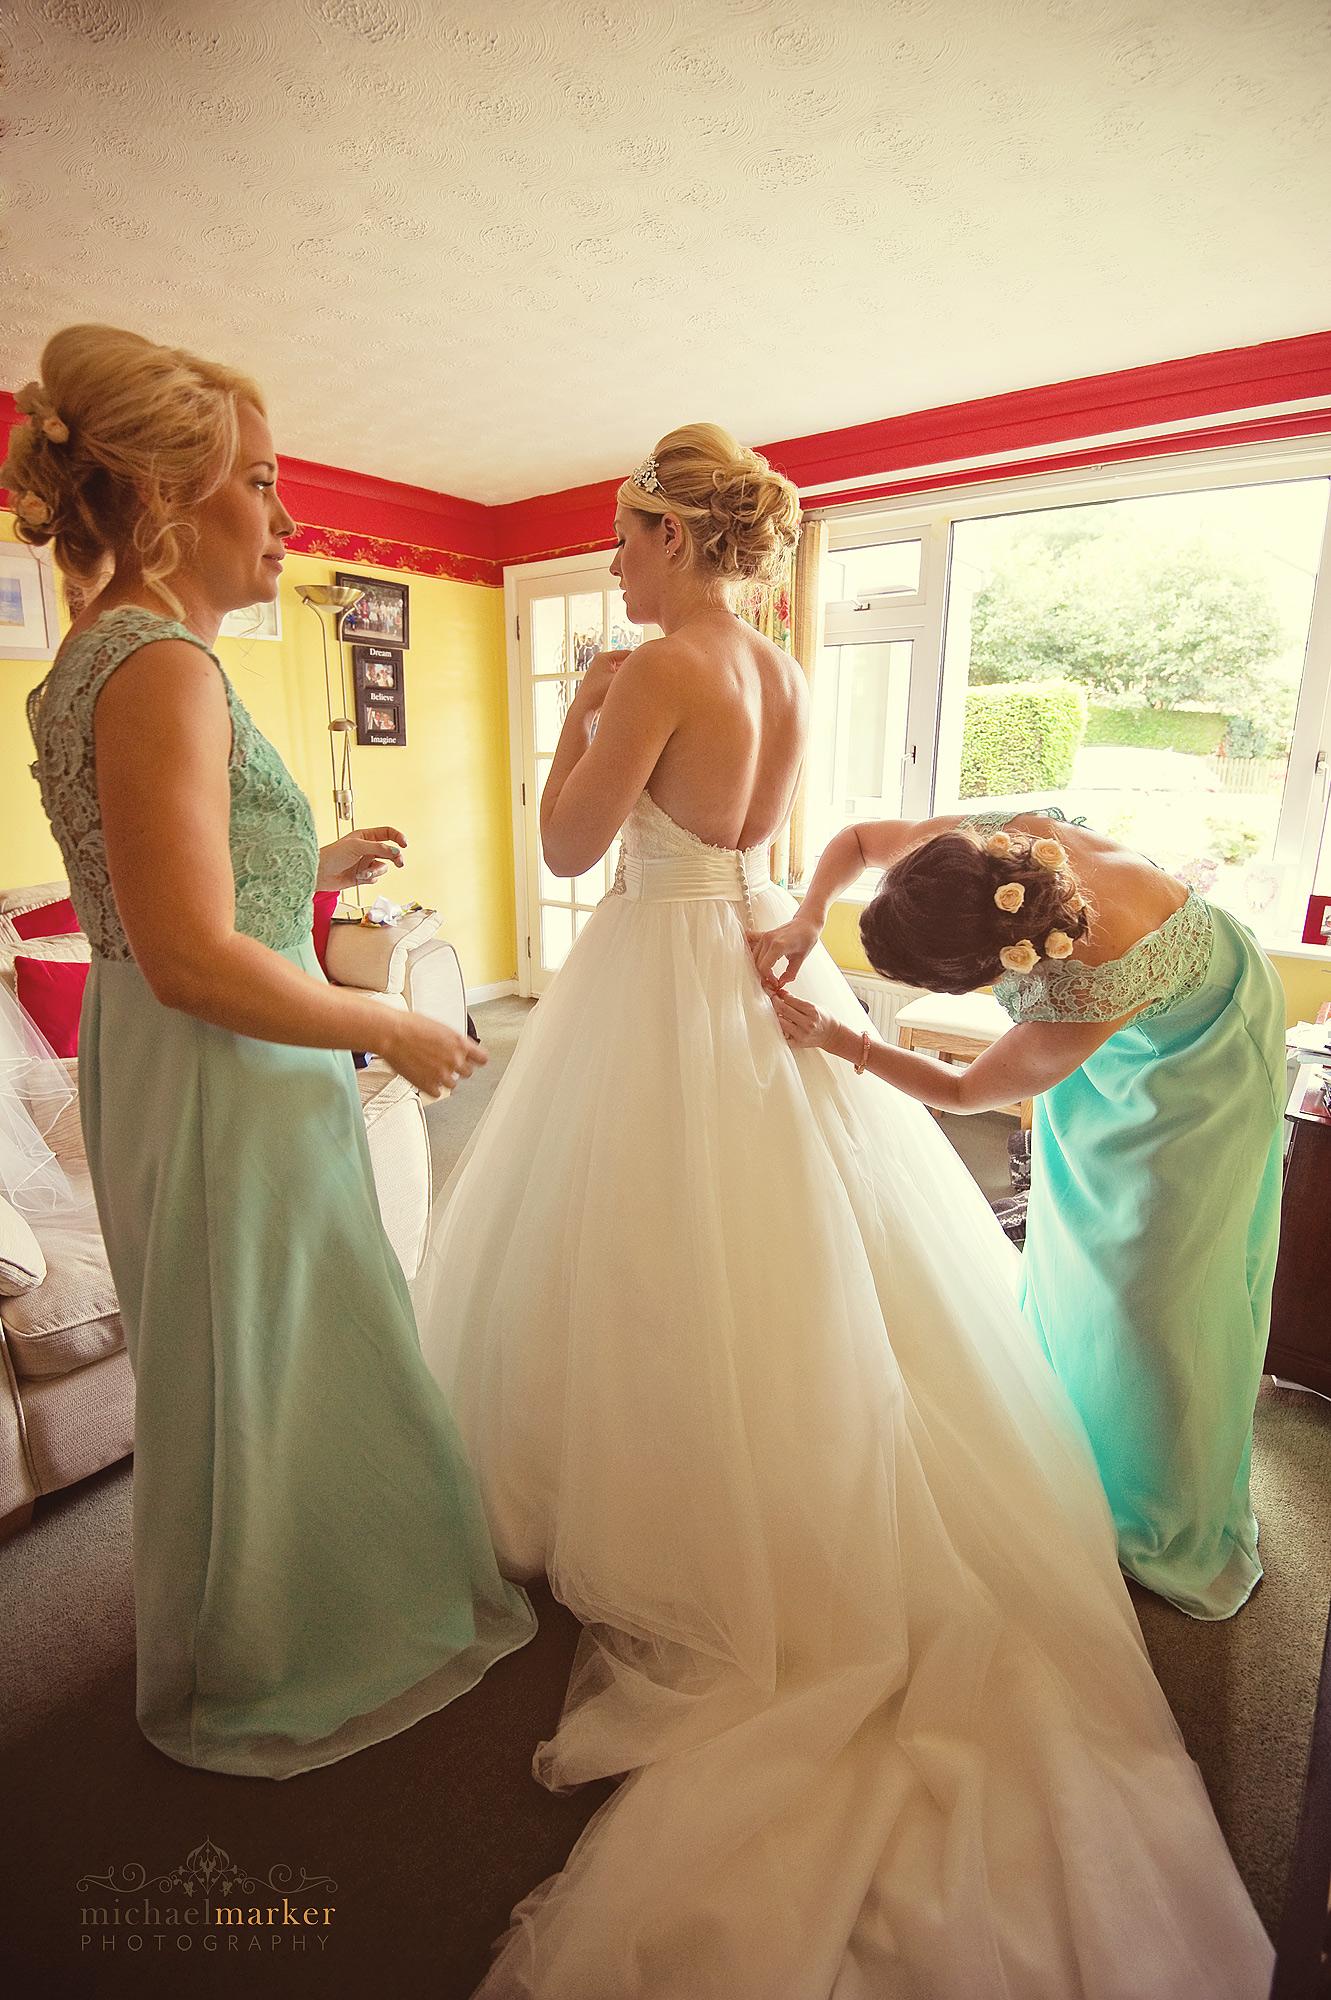 TwoBridges-wedding-2015-5c